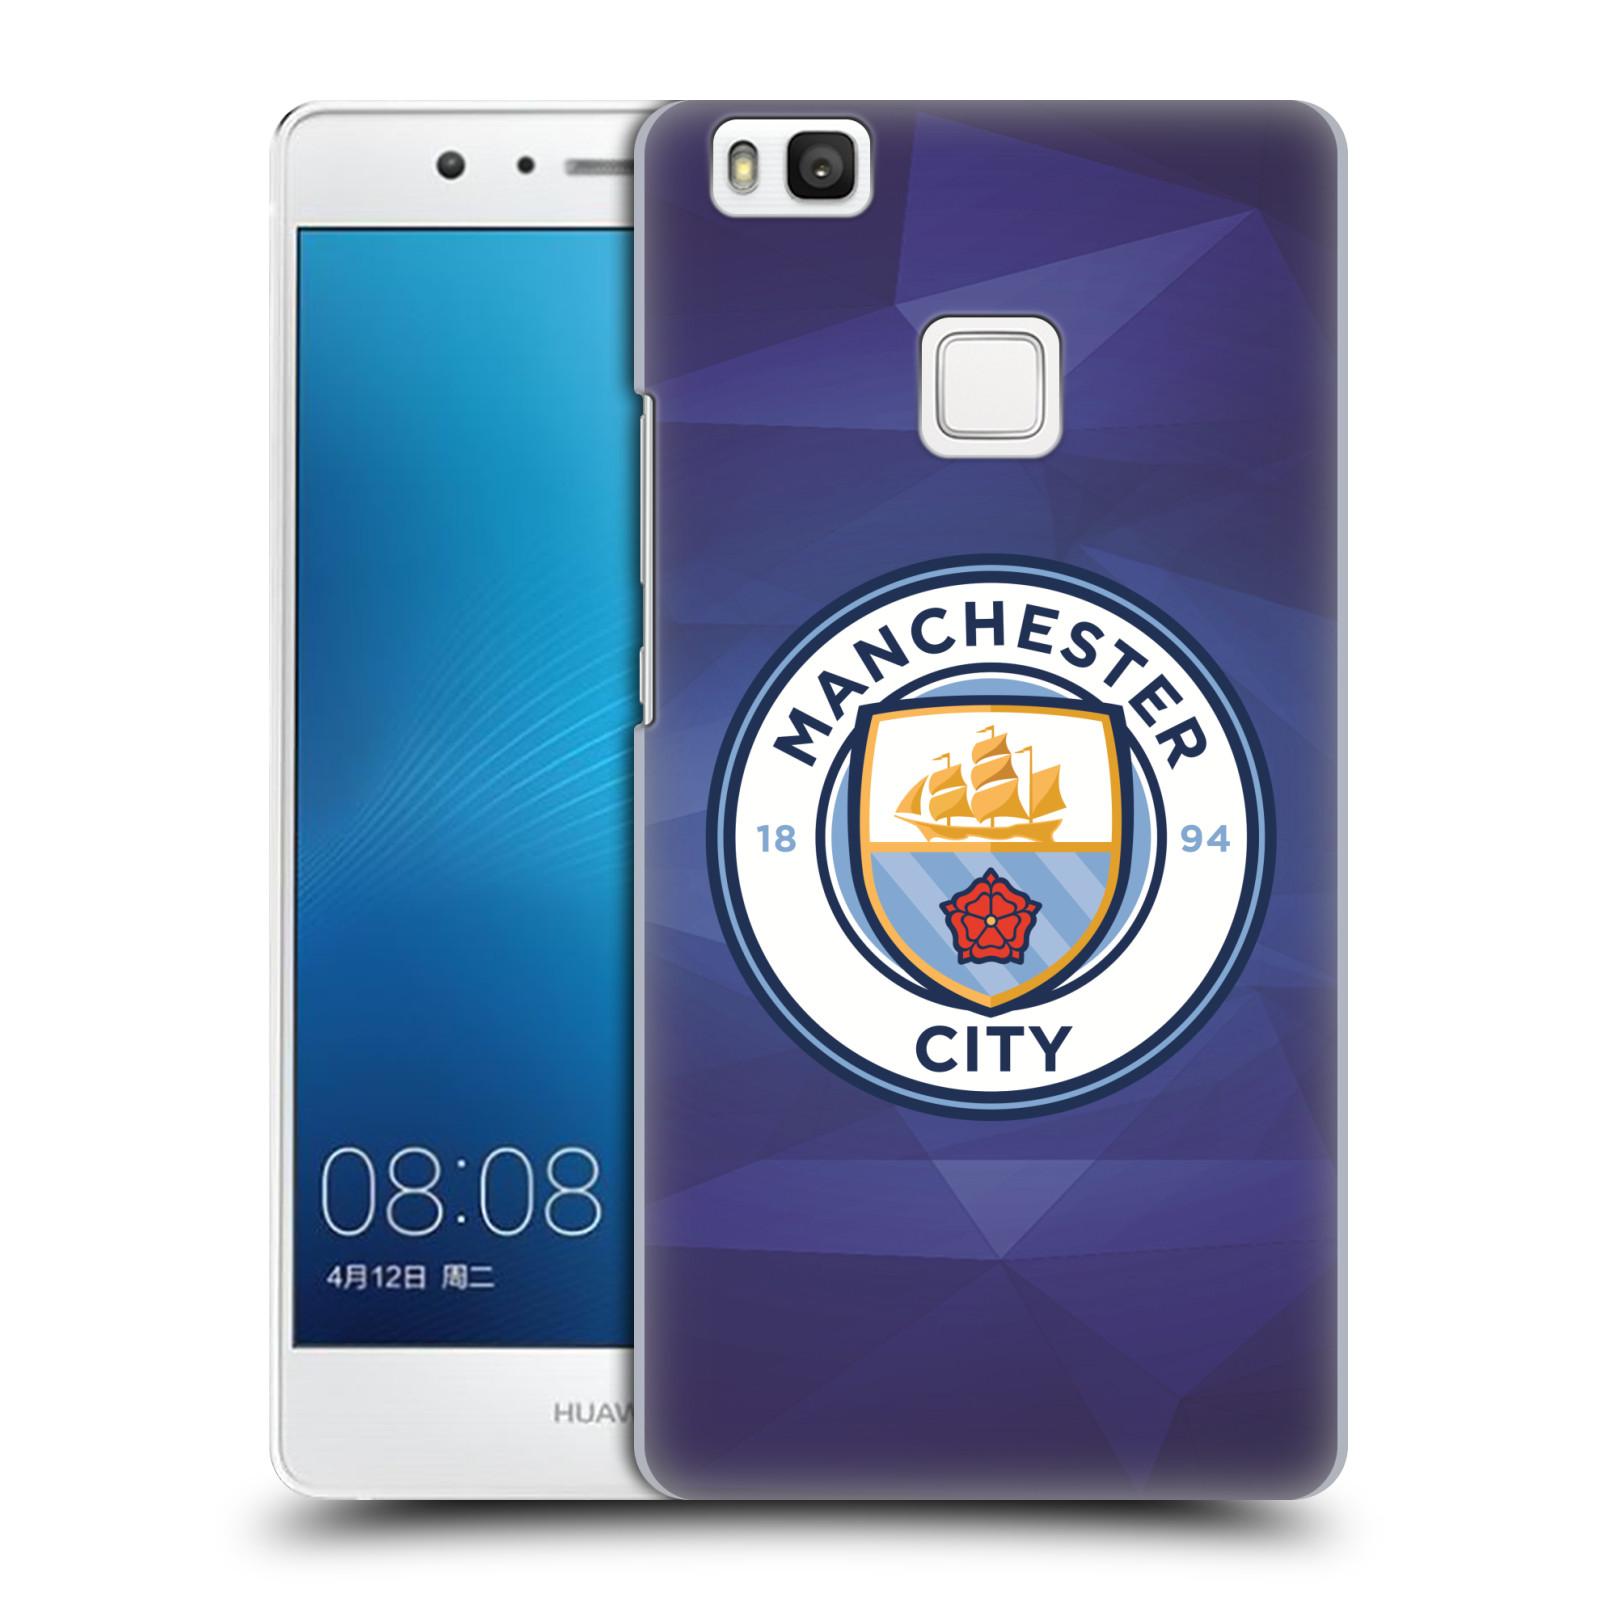 Plastové pouzdro na mobil Huawei P9 Lite HEAD CASE Manchester City FC - Modré nové logo